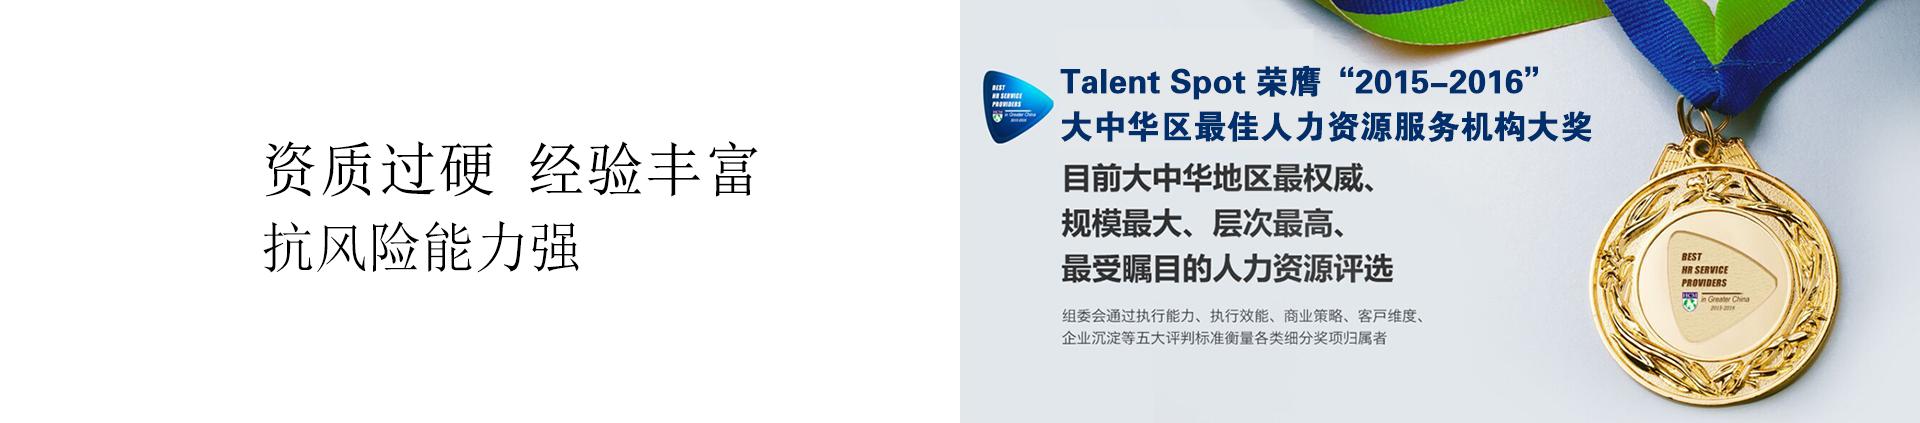 Talent Spot 上海力德,大众化区最佳人力资源服务